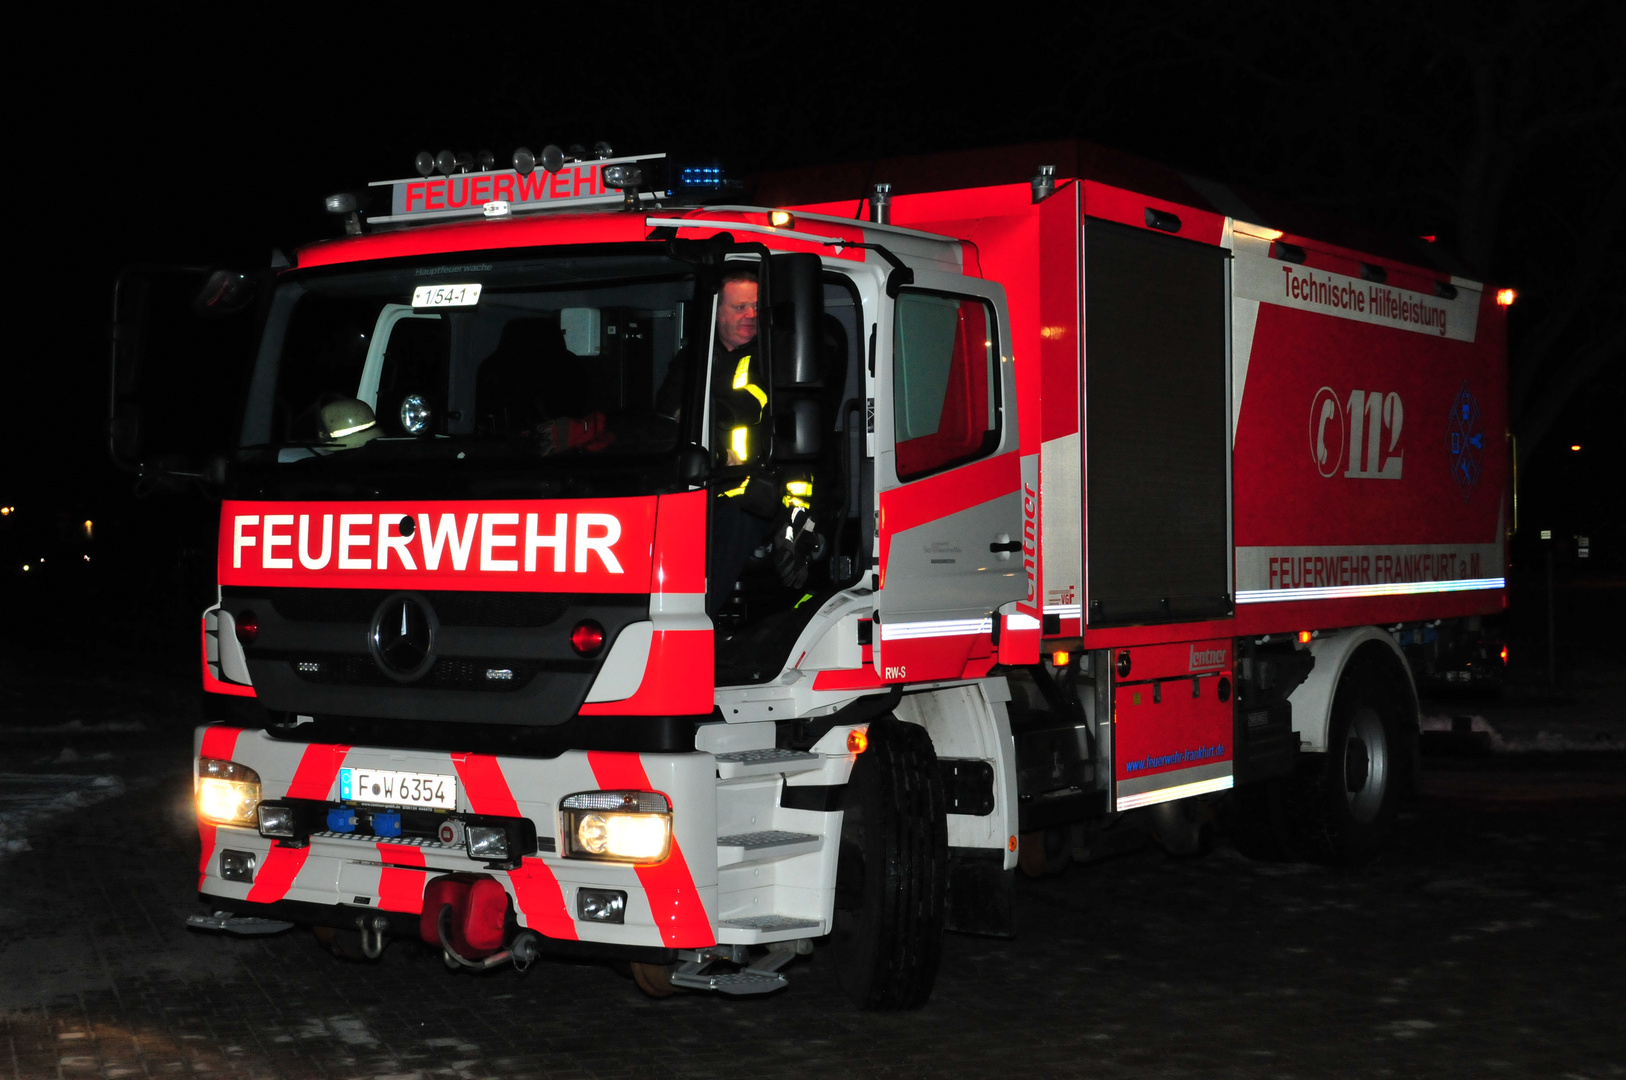 RW-Schiene (BF-Frankfurt)